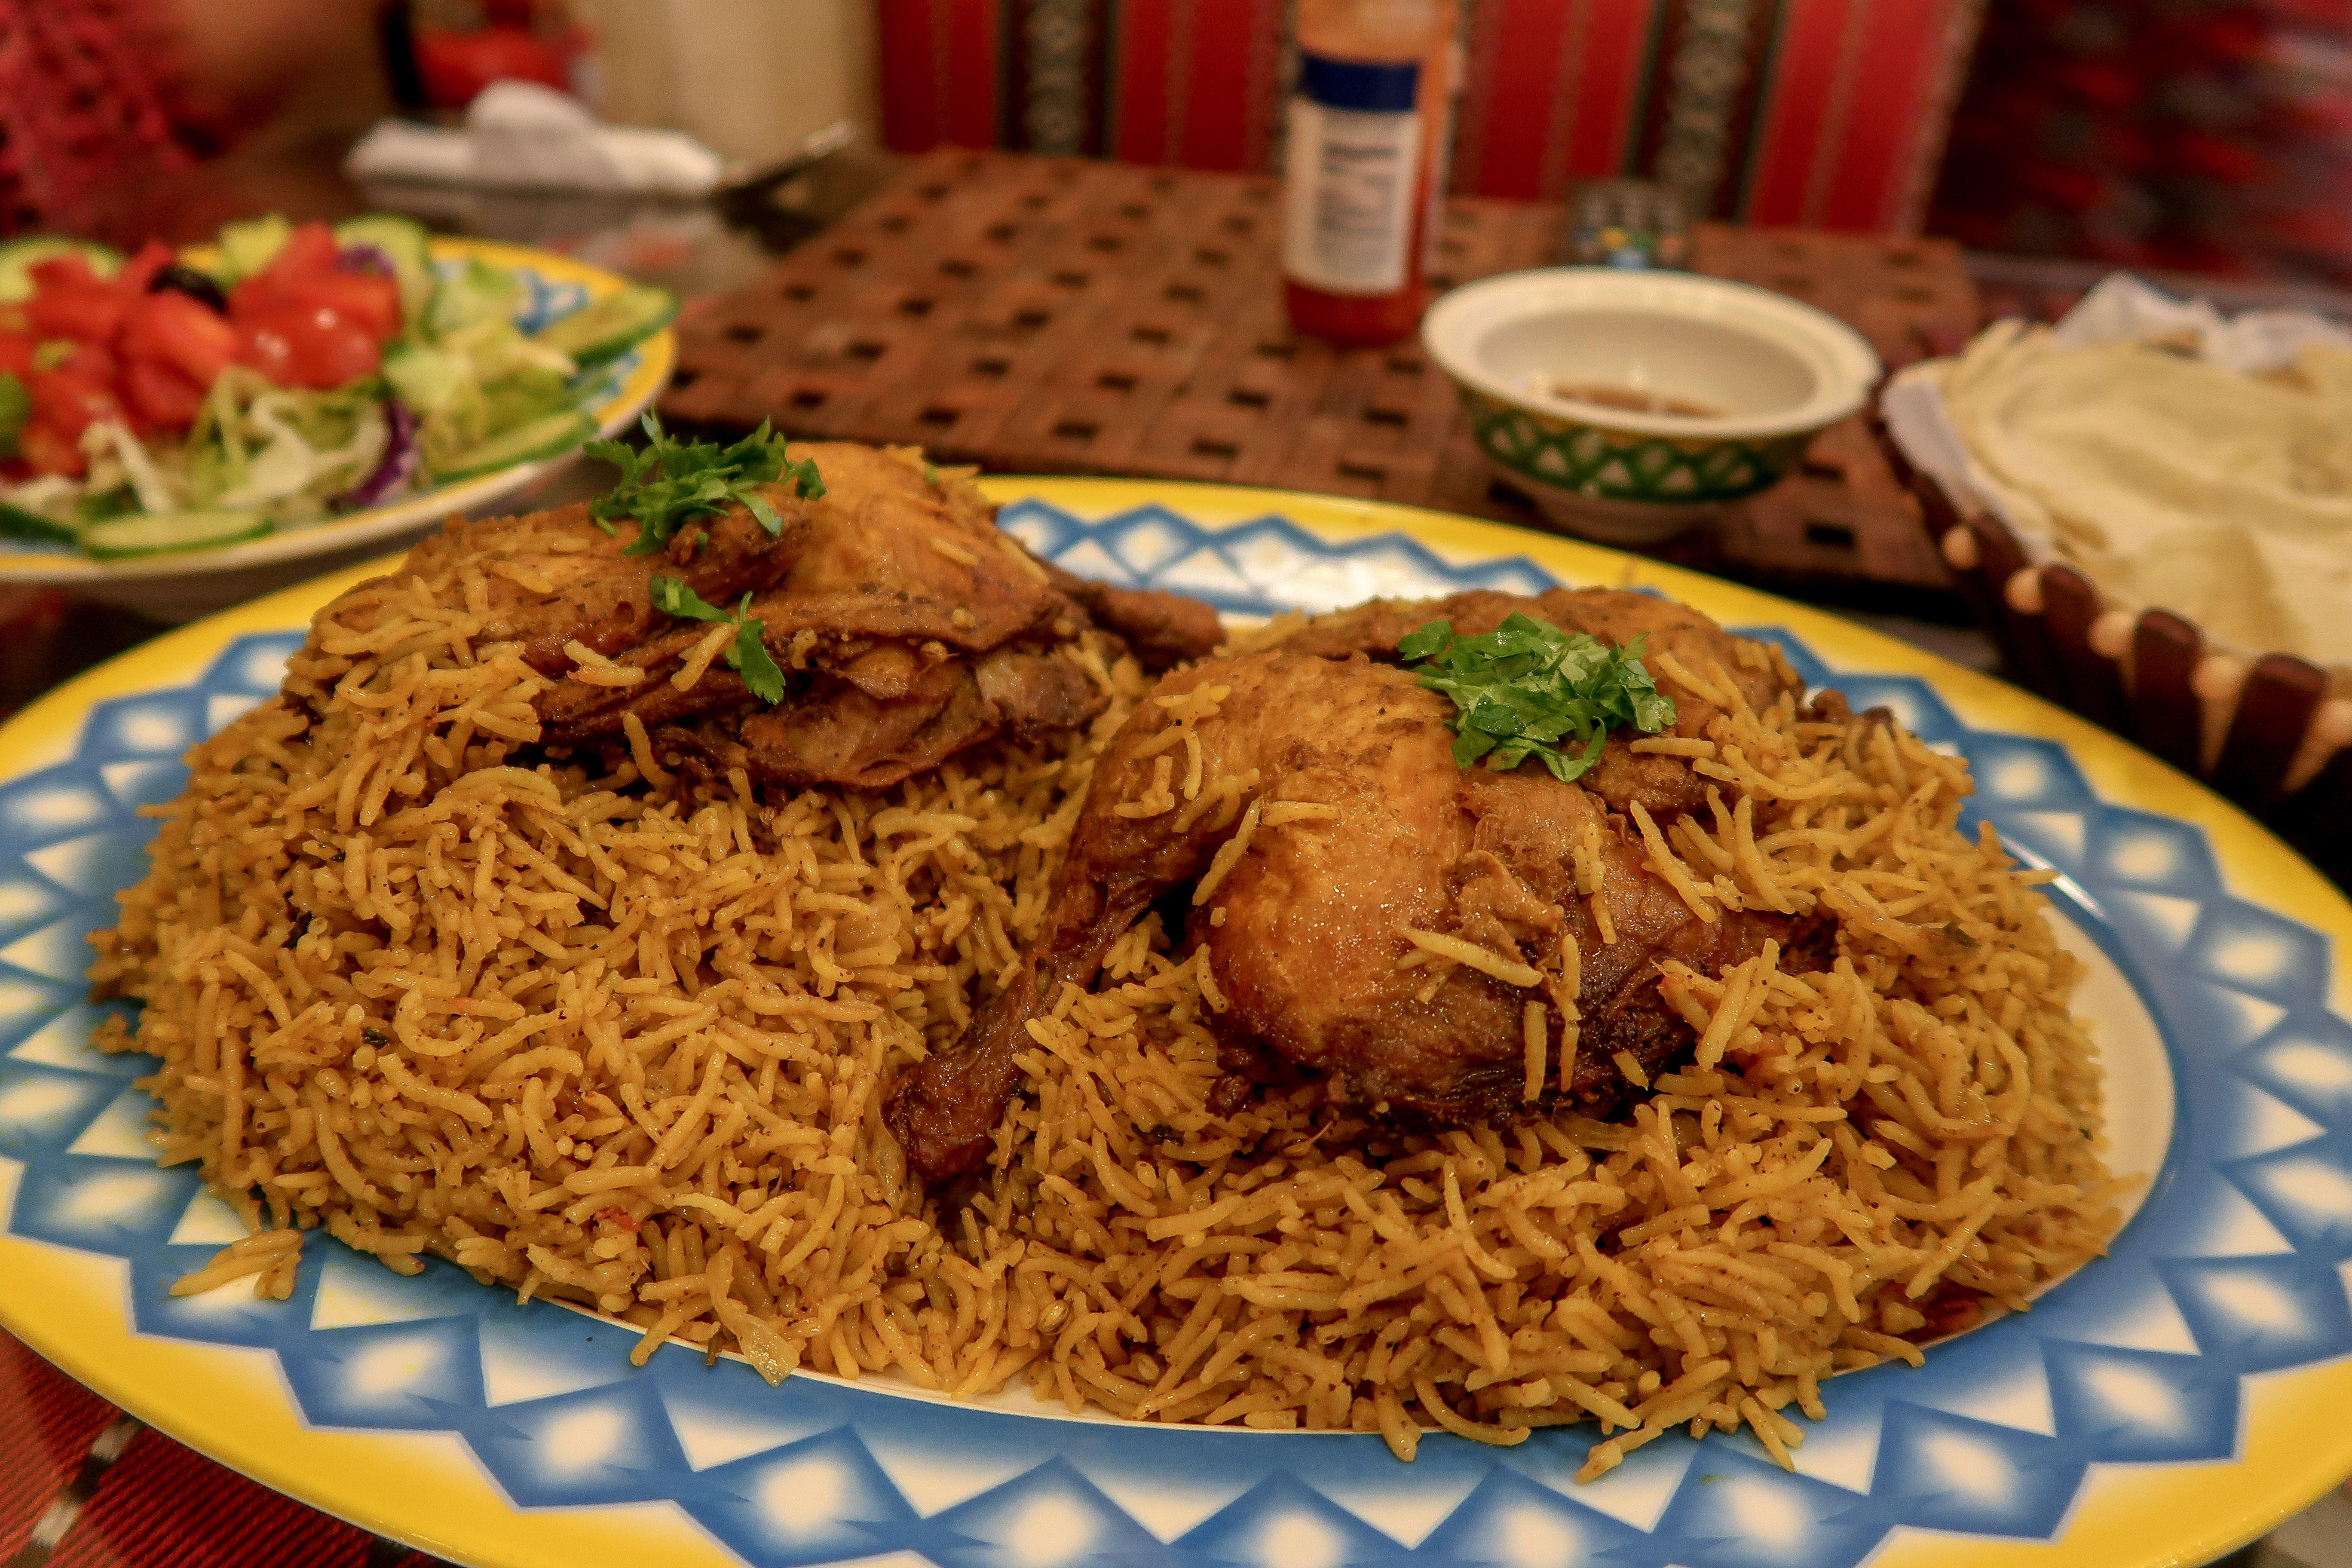 Where's good to eat in Doha, Qatar 2